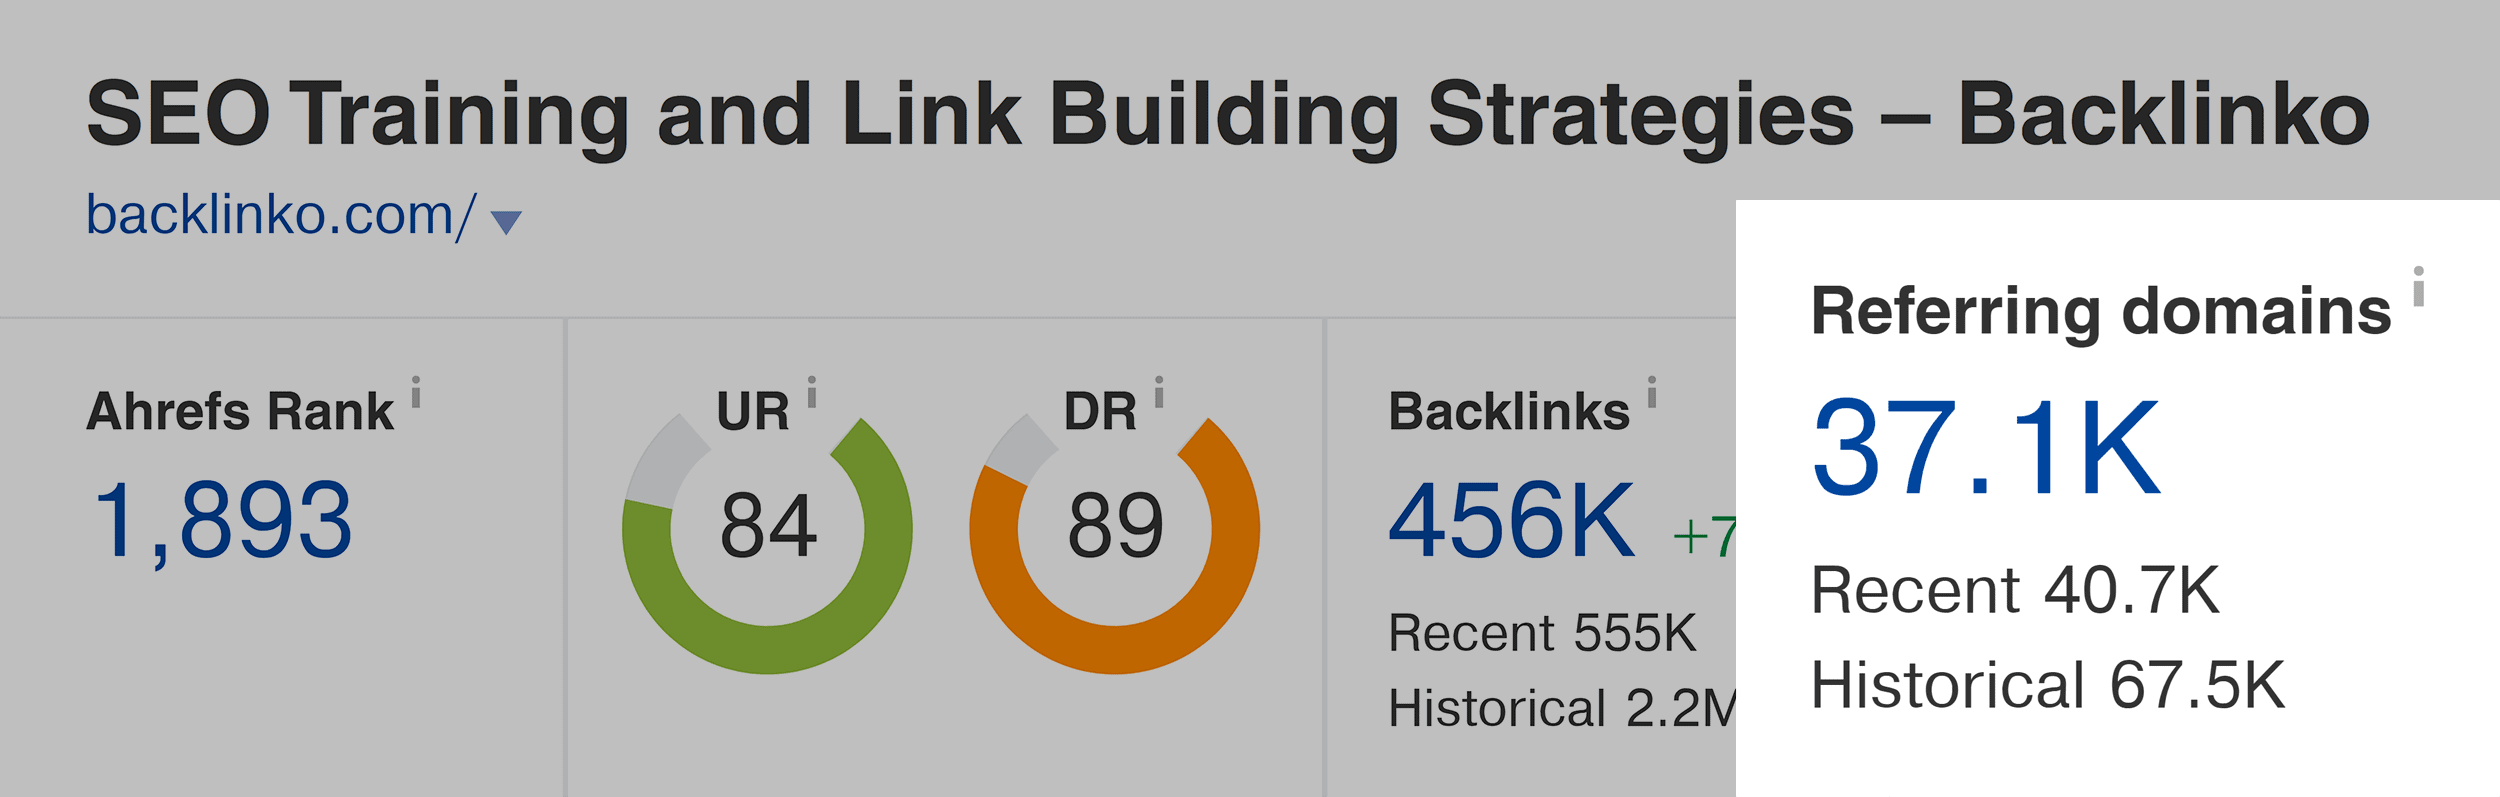 Ahrefs – Backlinko – Referring domains – October 2021